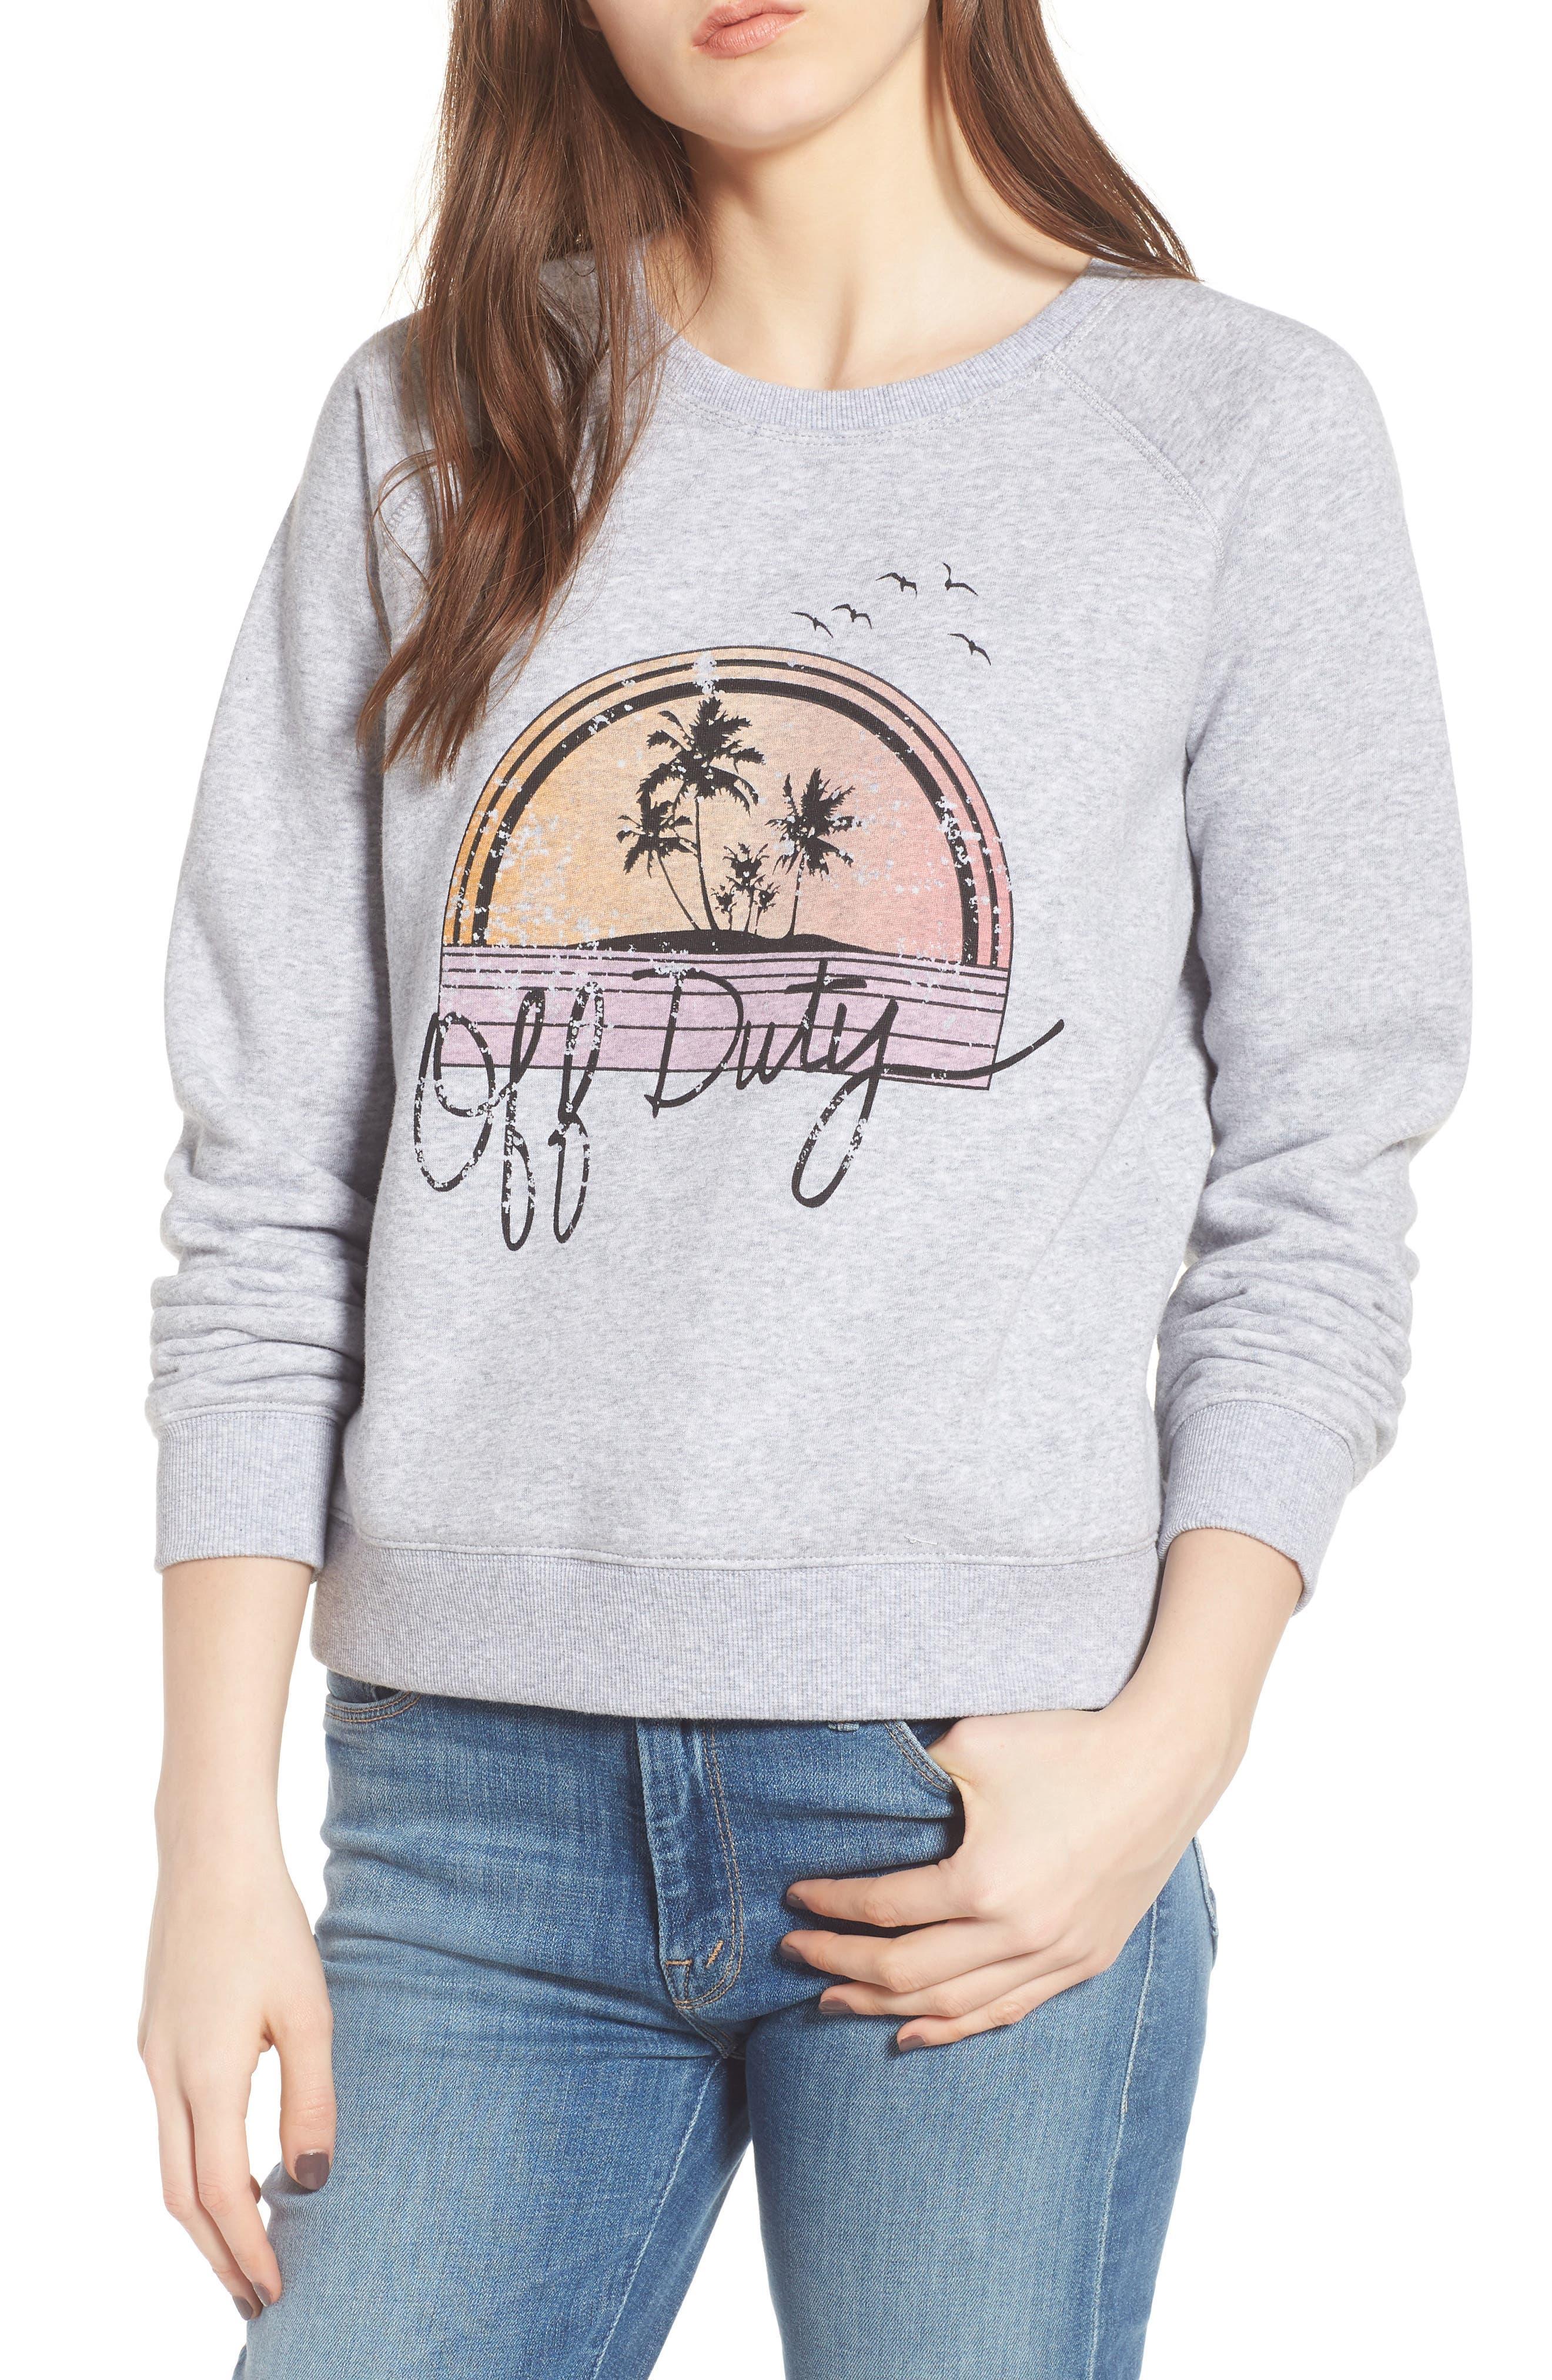 Off Duty Sweatshirt,                         Main,                         color, 026